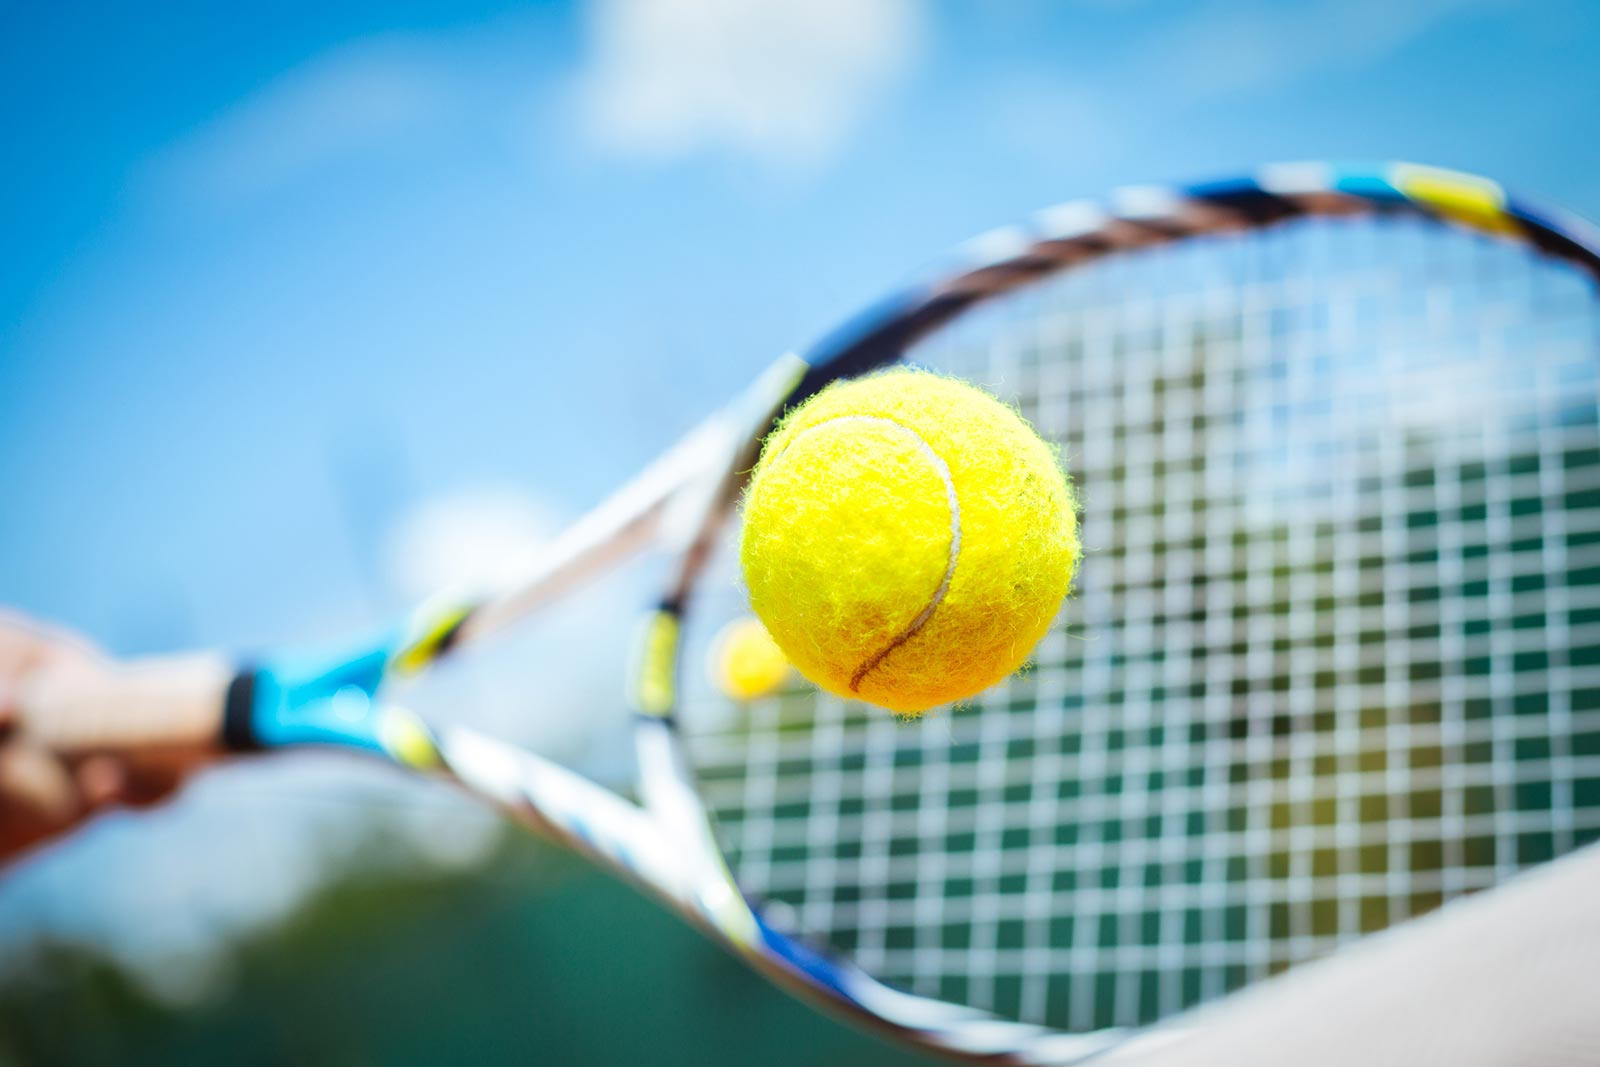 Tennis North Shore Winter Club